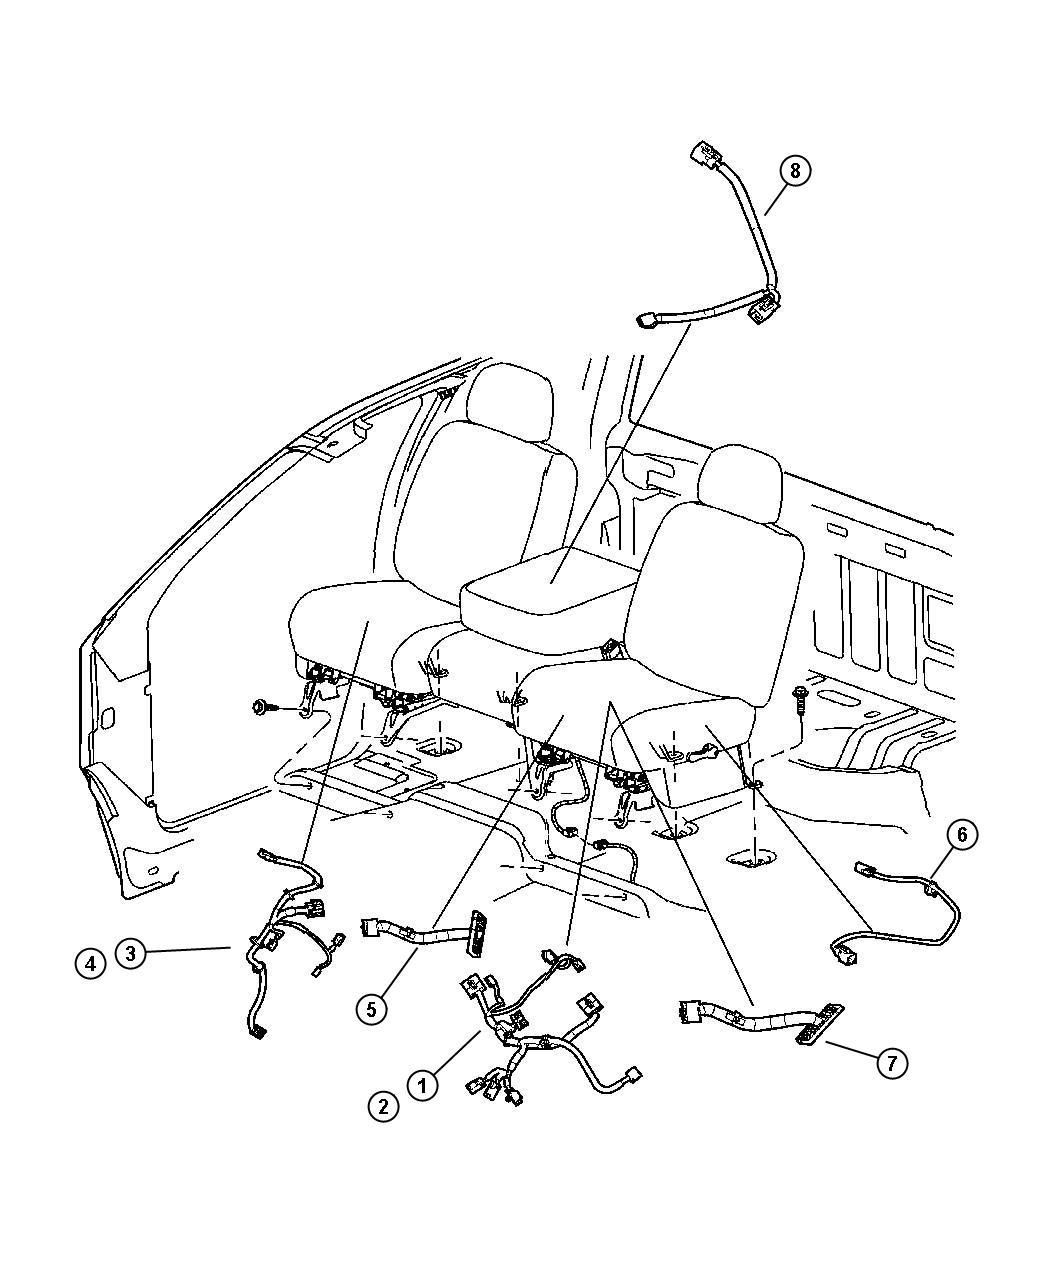 2005 Dodge Ram 1500 Wiring. Jumper. Power seat. Left, left